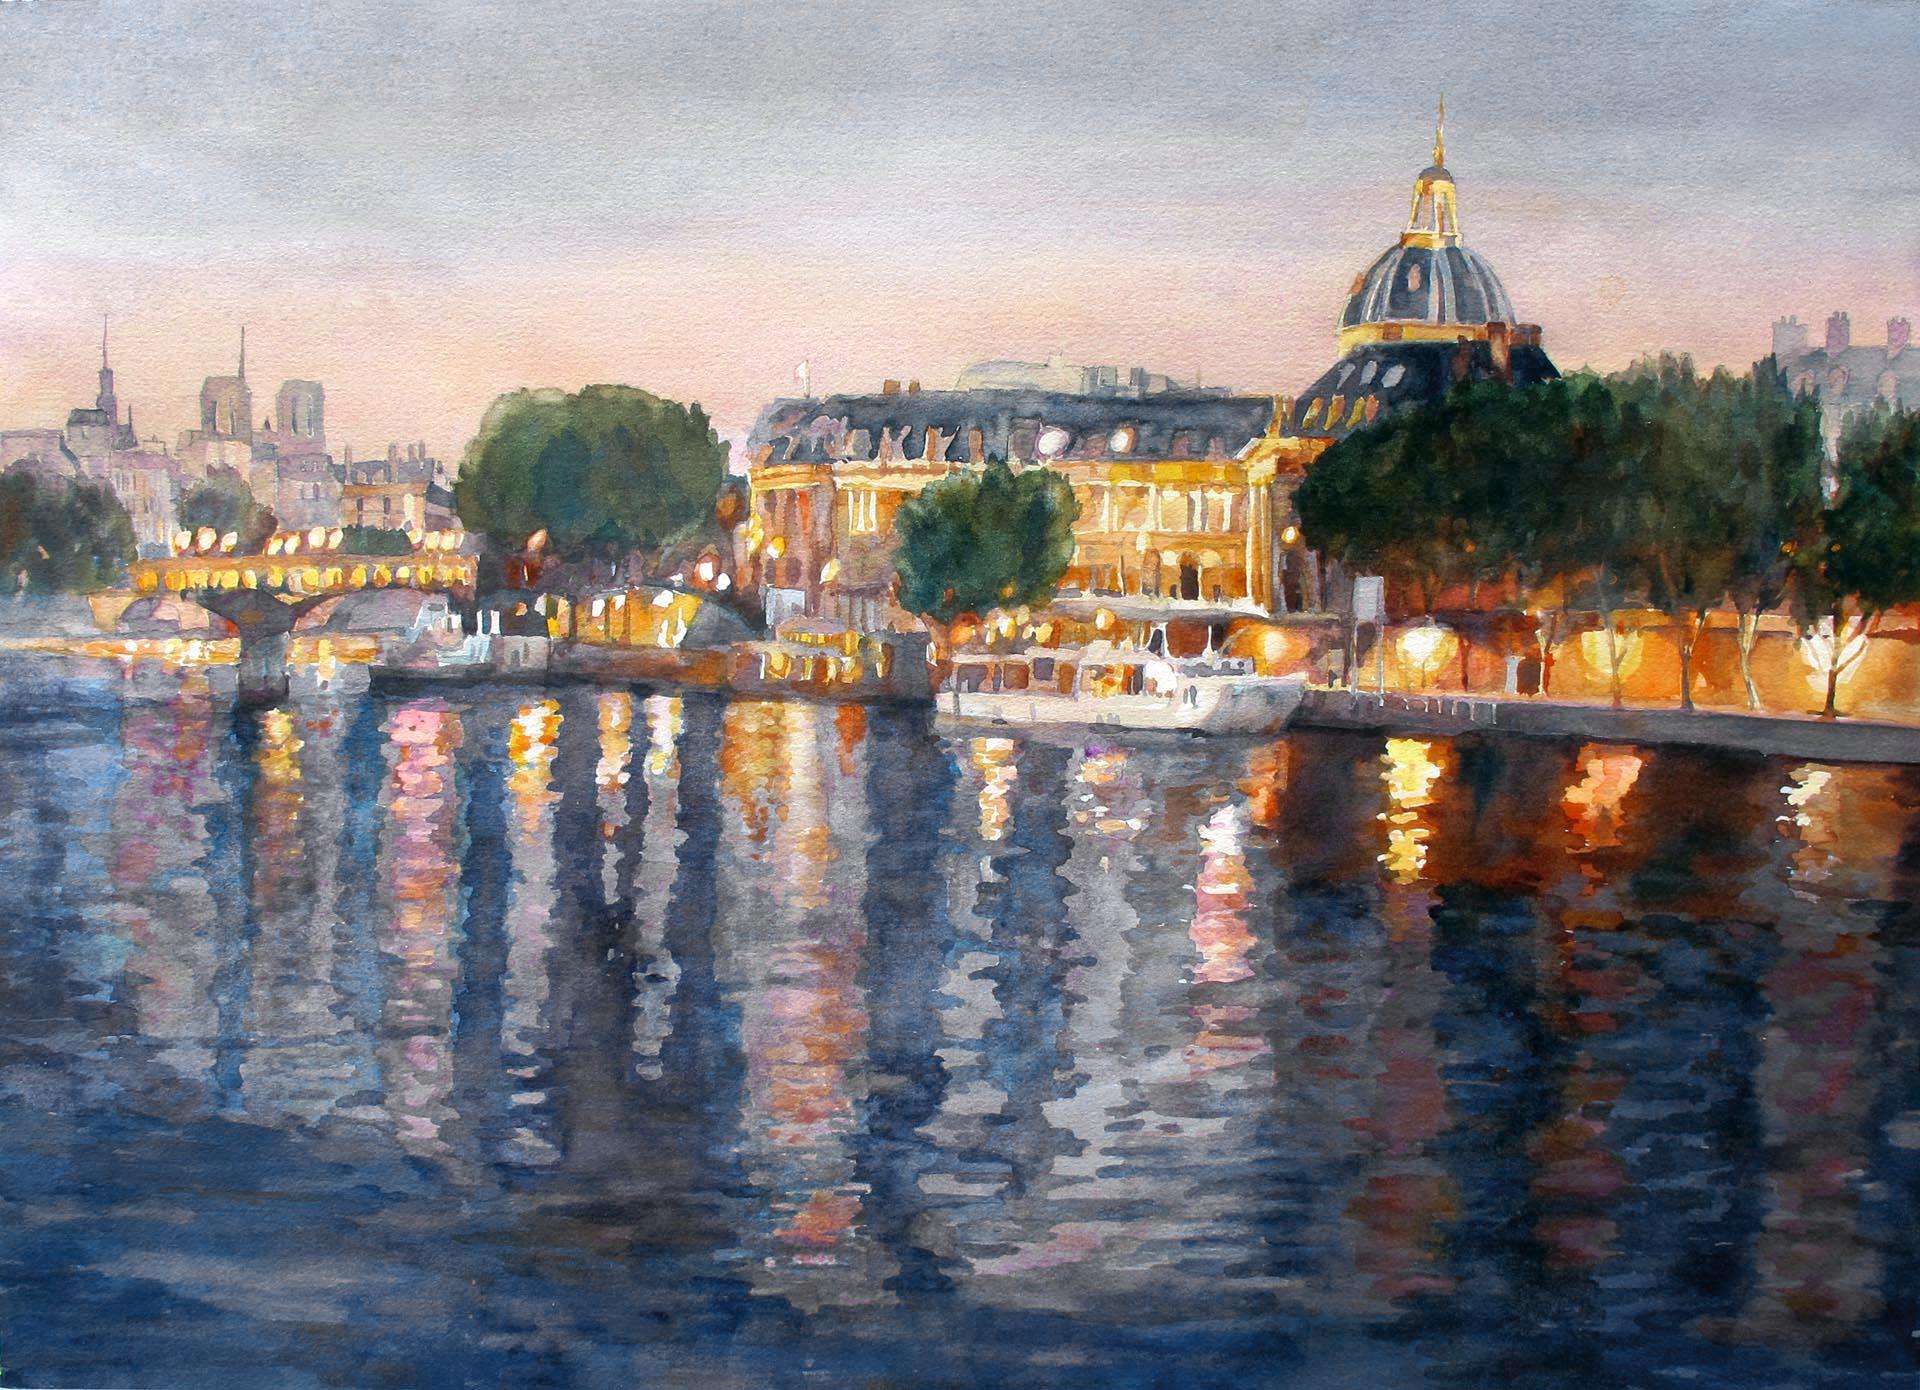 Pont des Arts - City of Lights